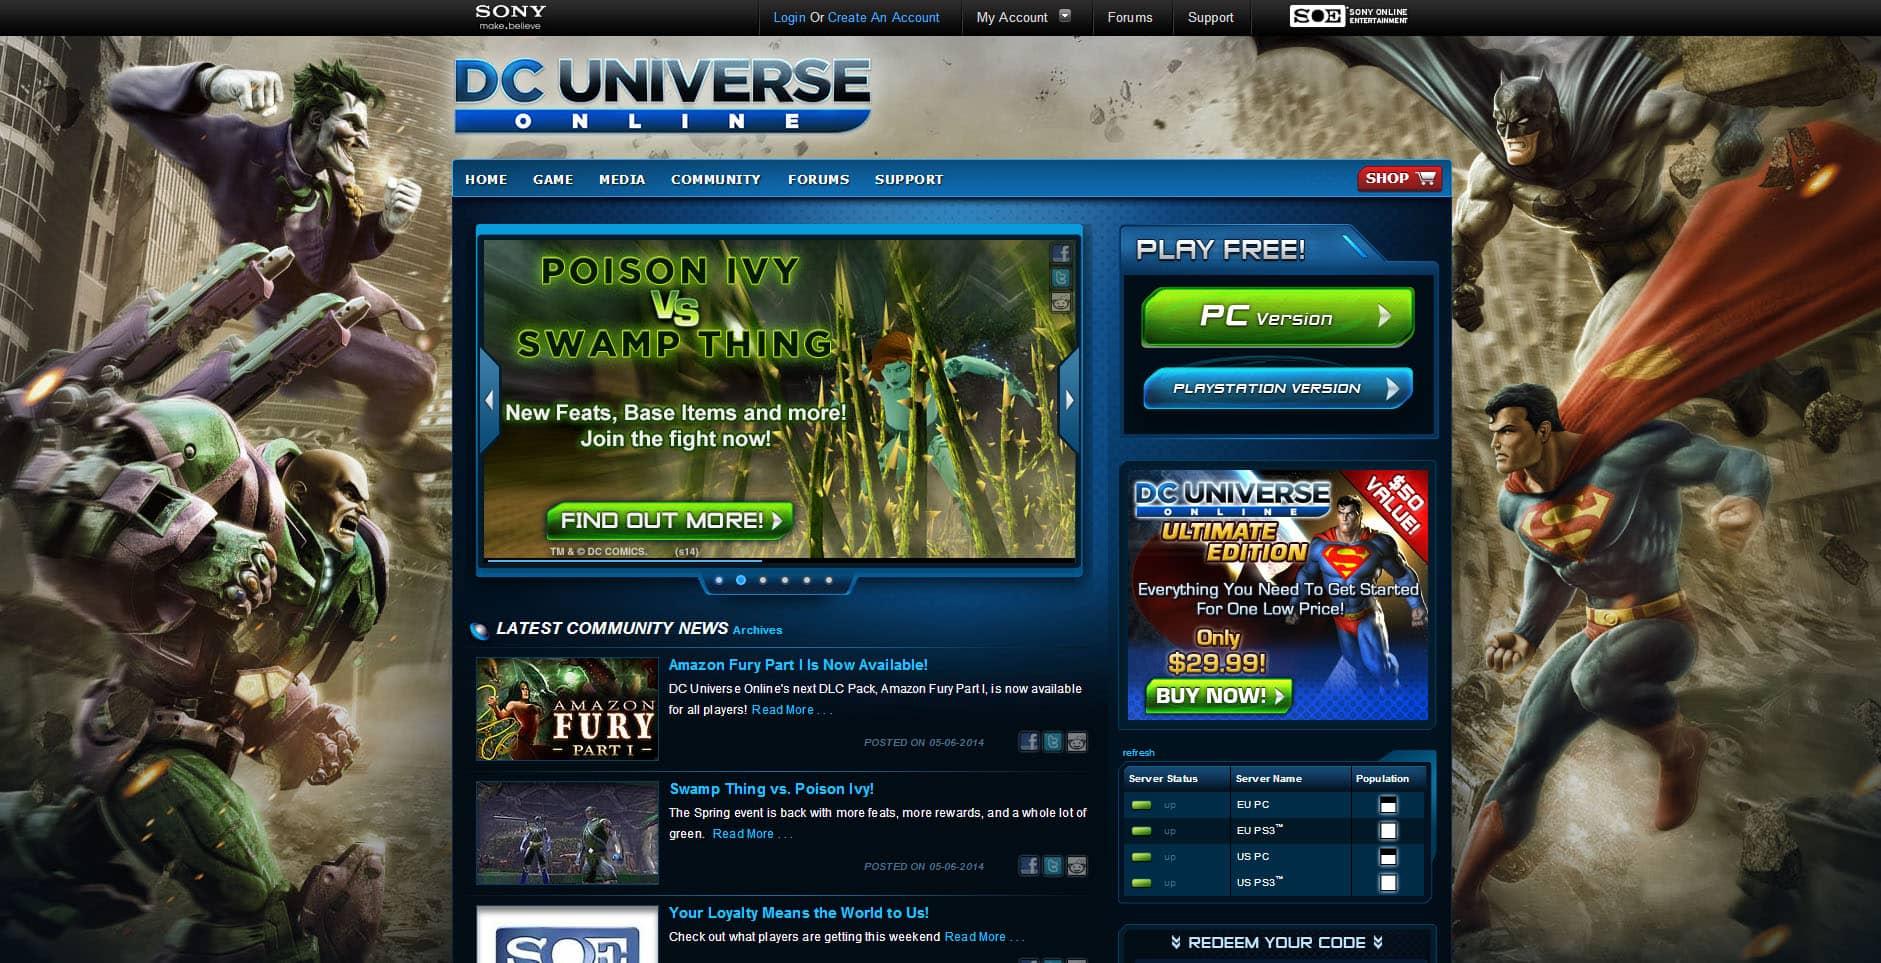 DC Universe Online - Aaron Bartholomew Development